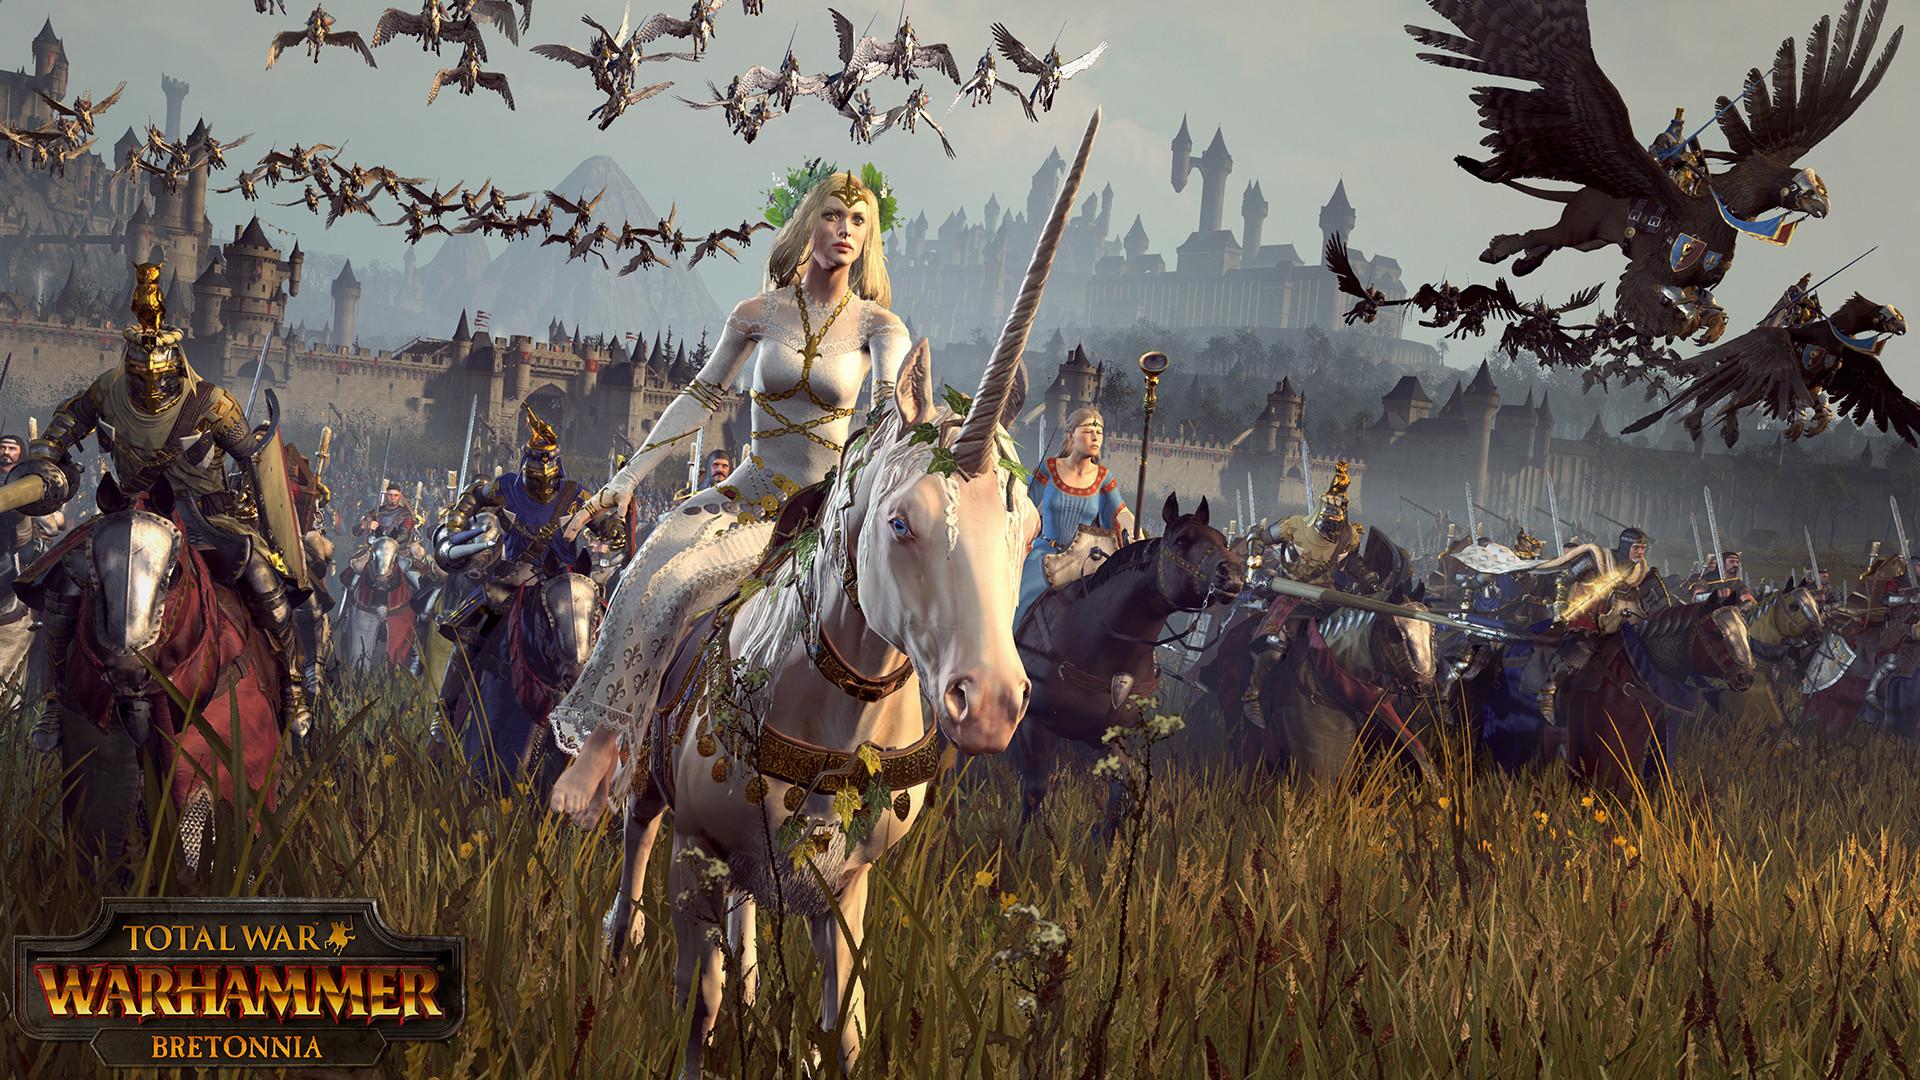 Total War Warhammer Wallpaper: Total War Warhammer II Wallpapers (84+ Images